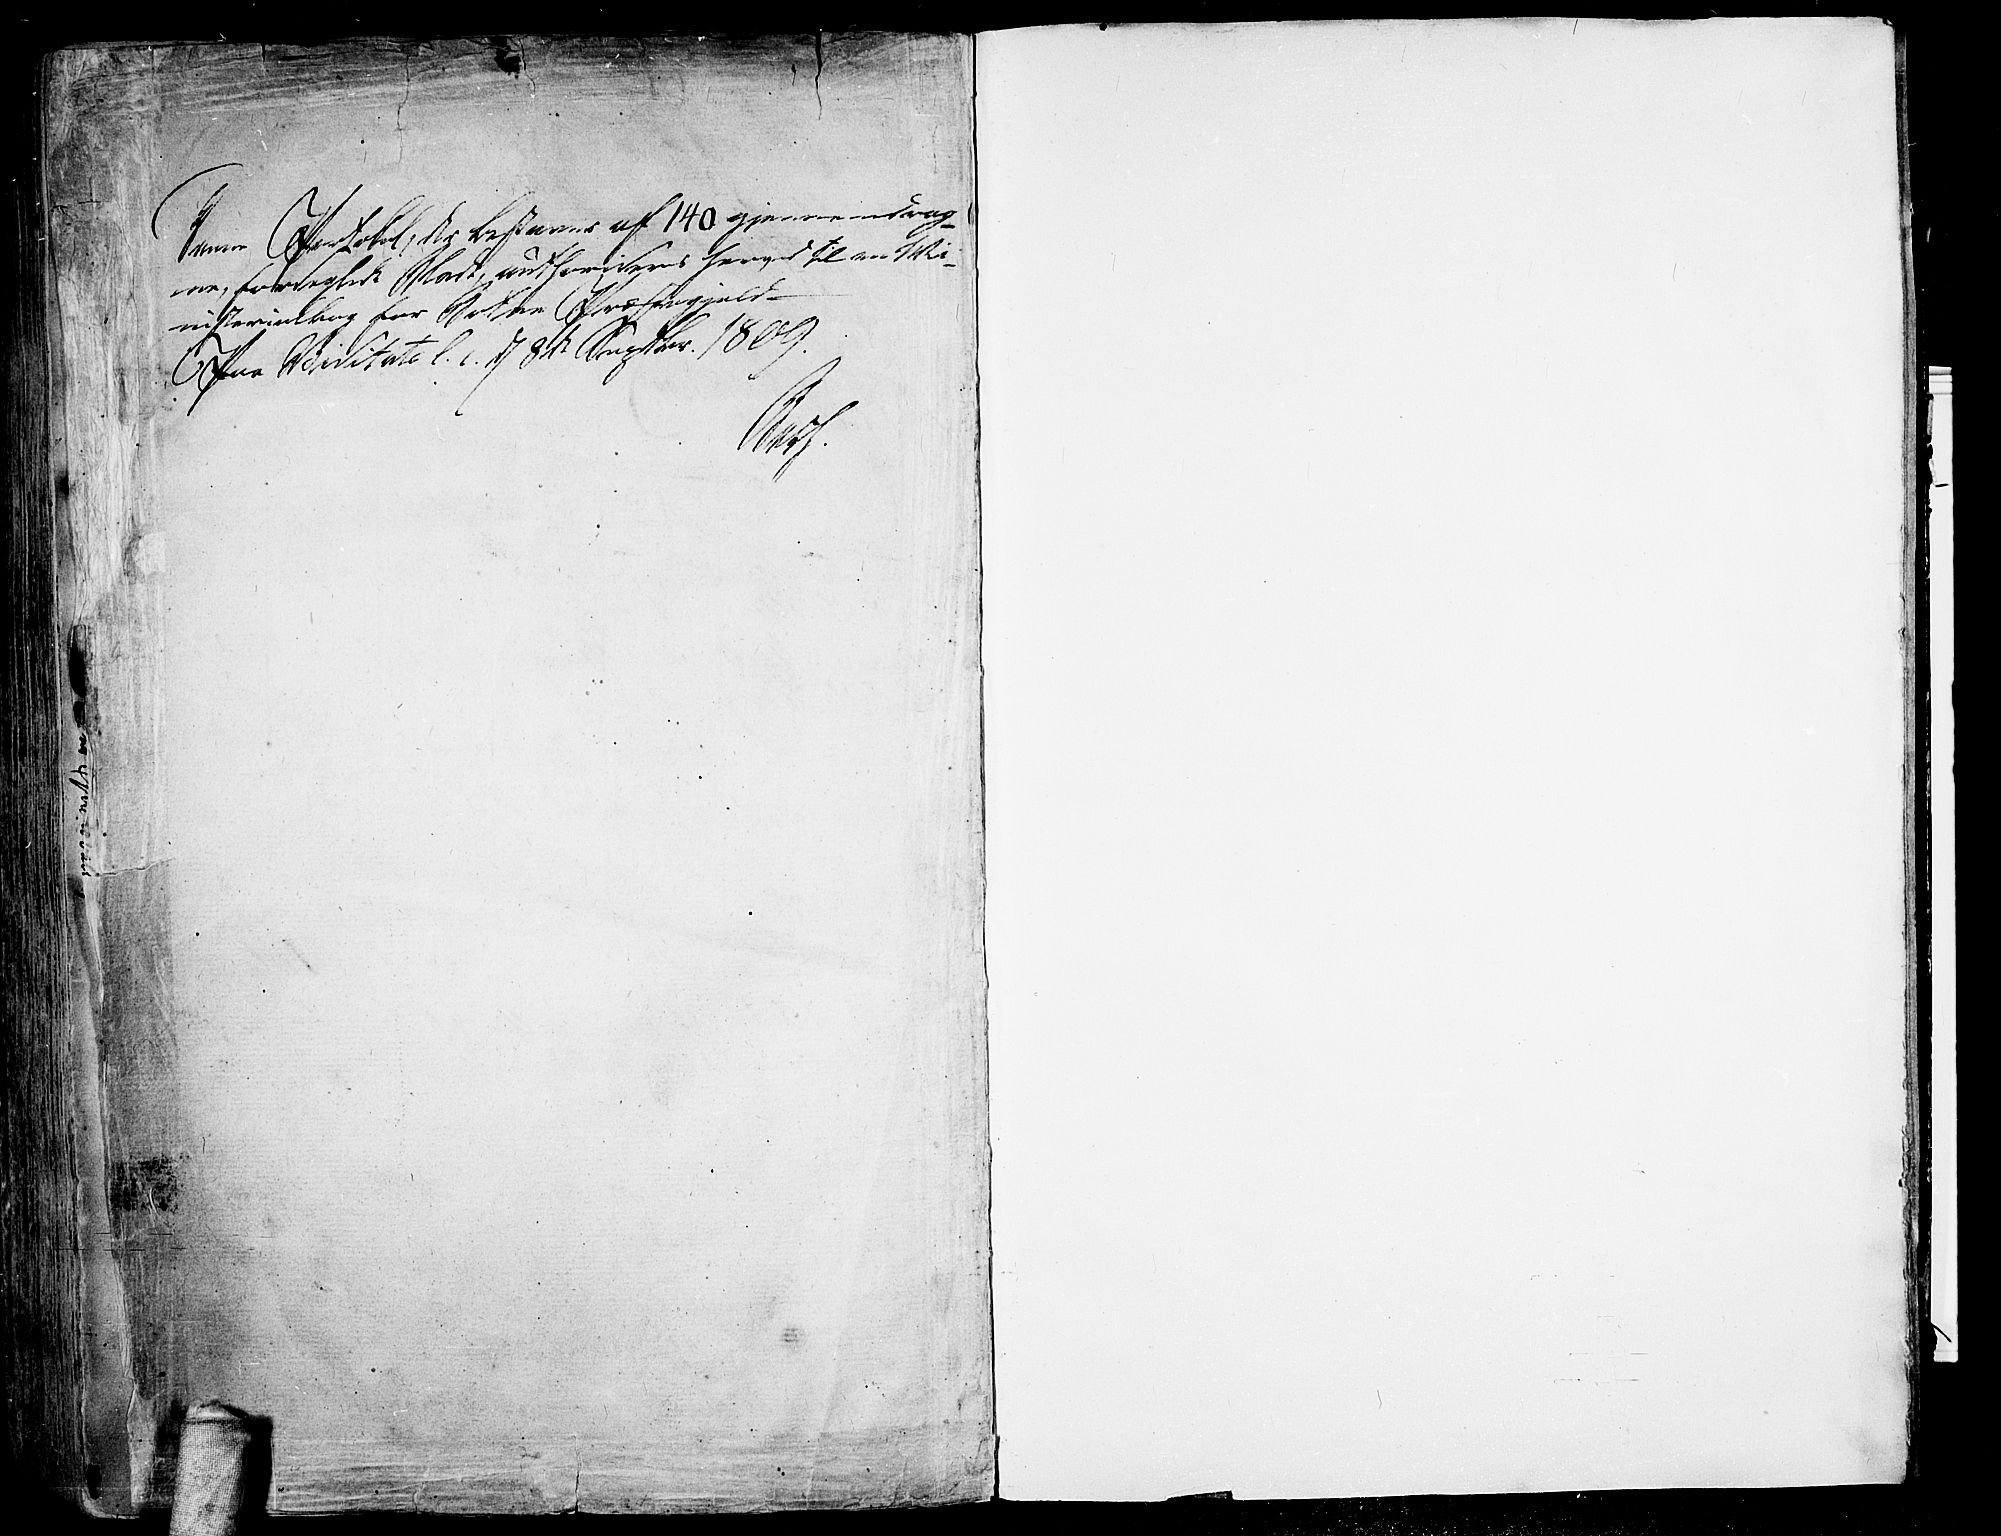 SAKO, Botne kirkebøker, F/Fa/L0003: Parish register (official) no. I 3 /1, 1792-1844, p. 280-281